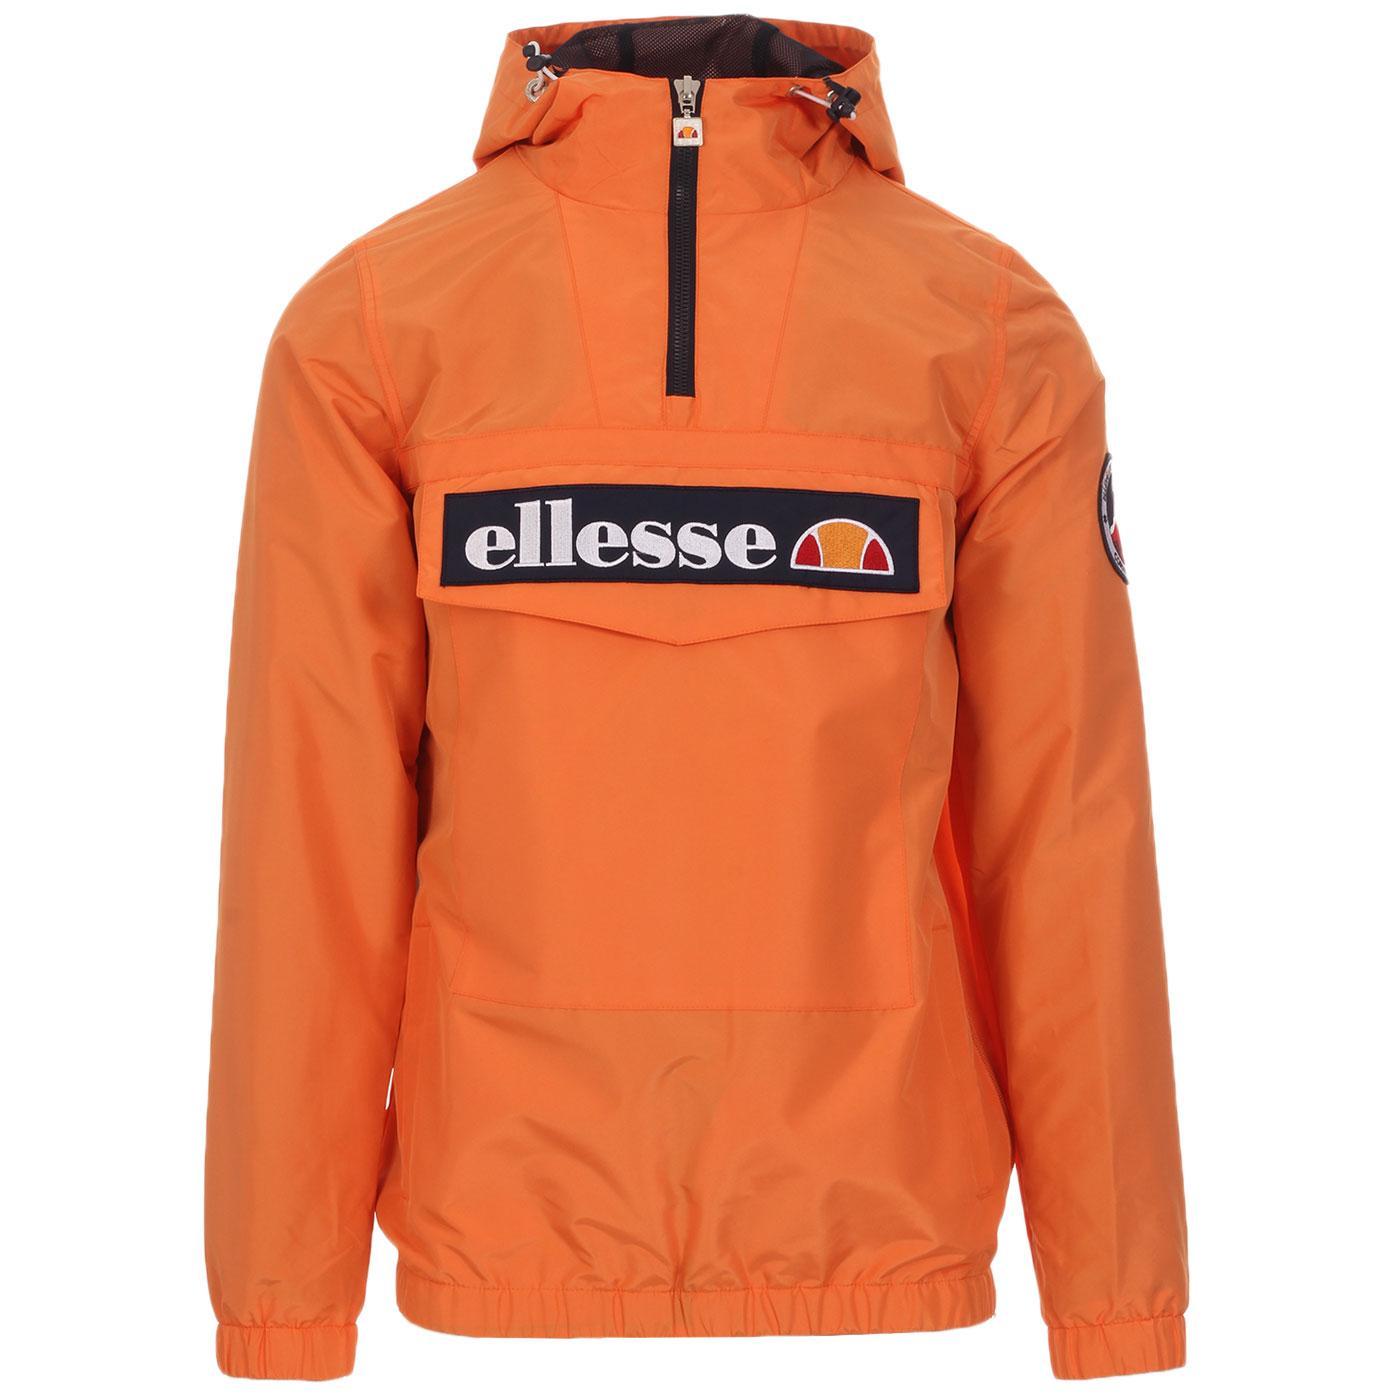 Mont 2 ELLESSE Retro 80s Overhead Jacket (Orange)